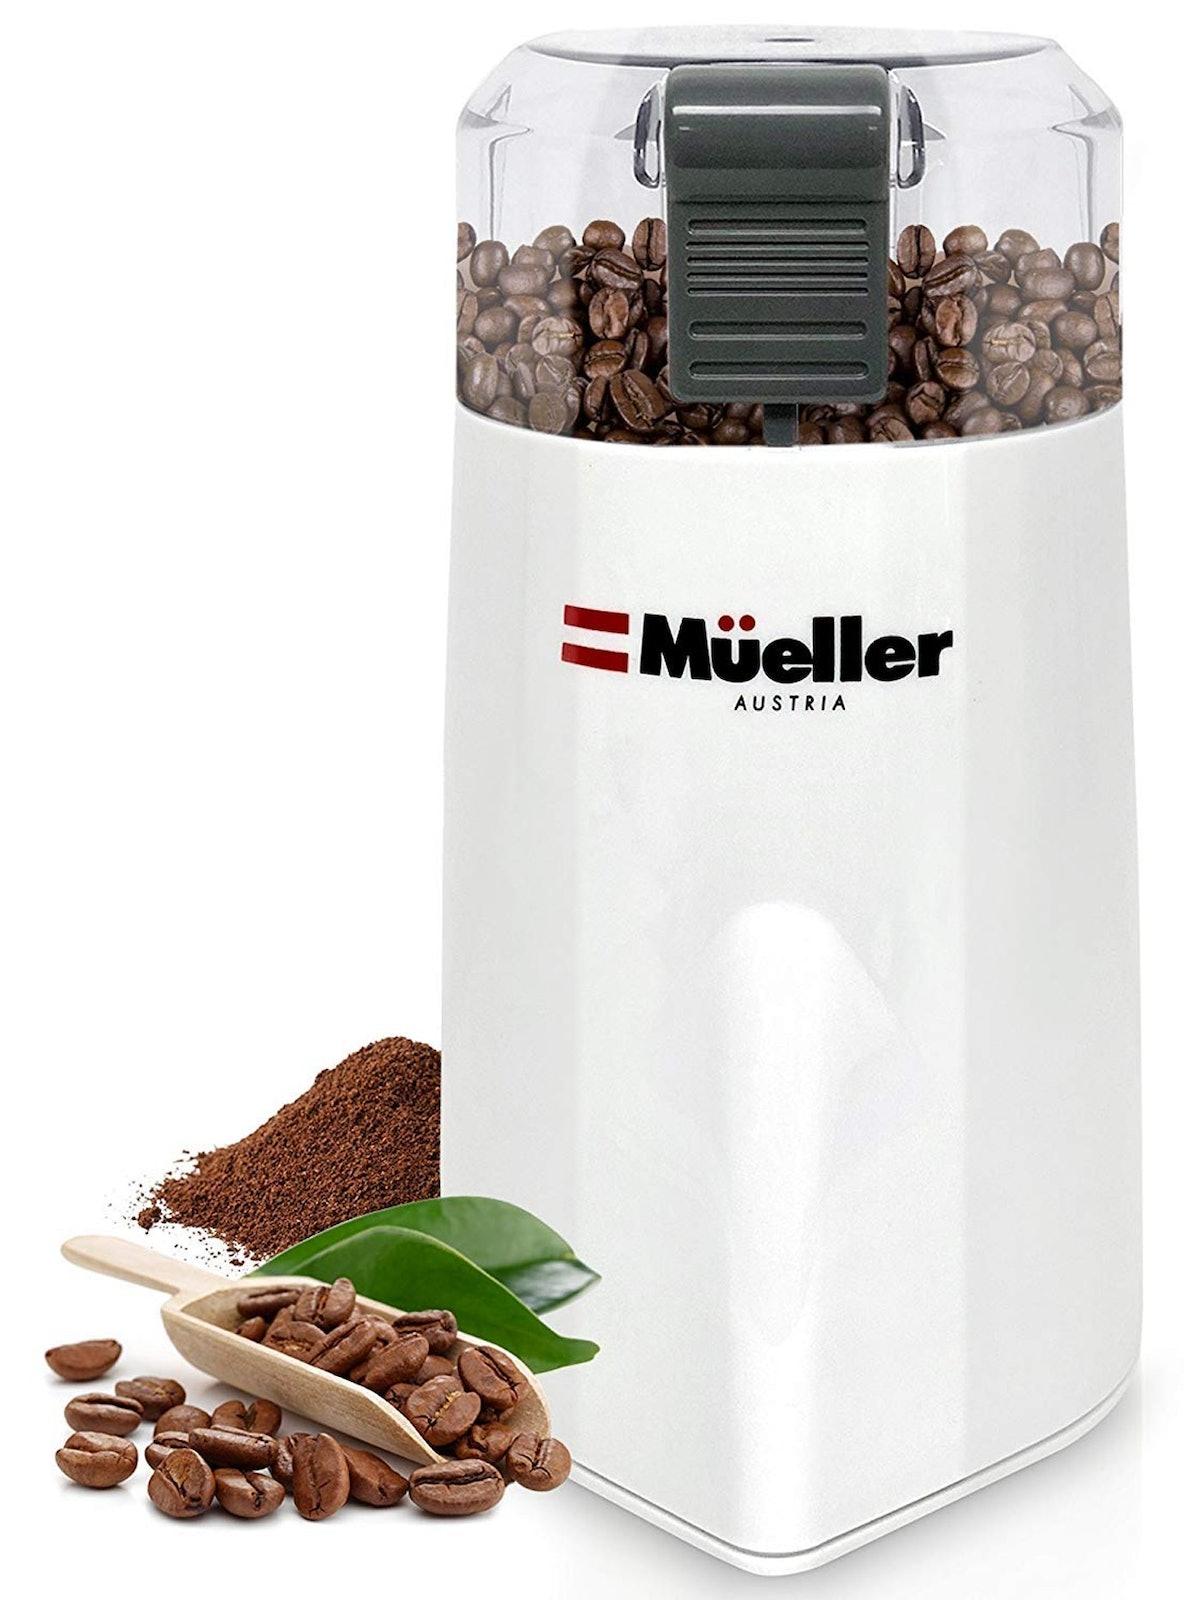 Mueller Austria Electric Coffee Grinder